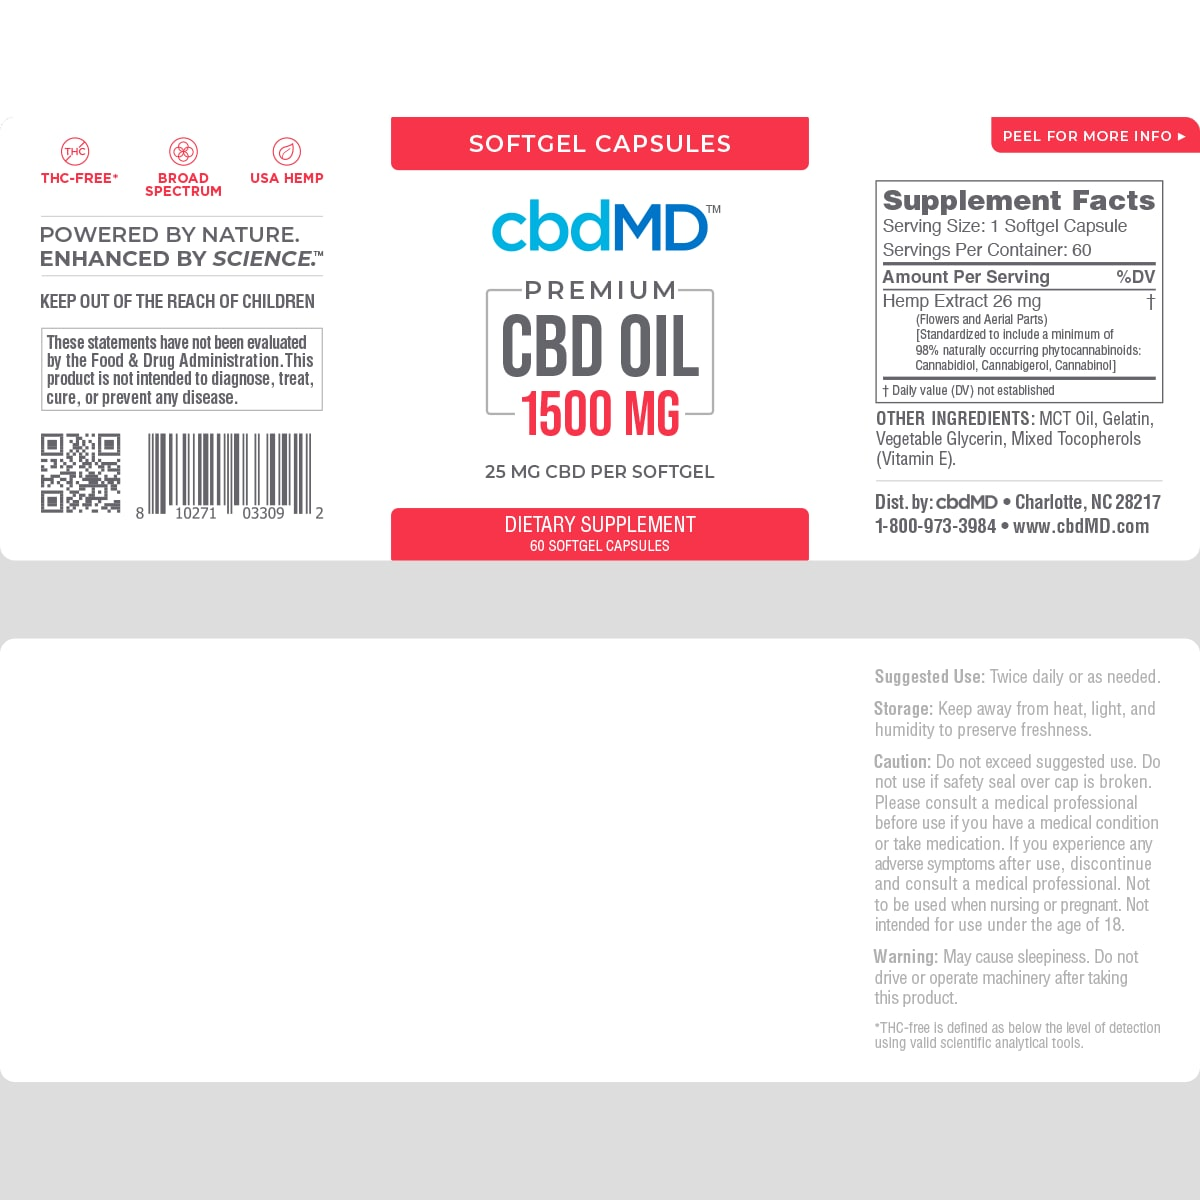 cbdMD, CBD Oil Softgel Capsules, Broad Spectrum THC-Free, 60-Count, 1500mg of CBD2